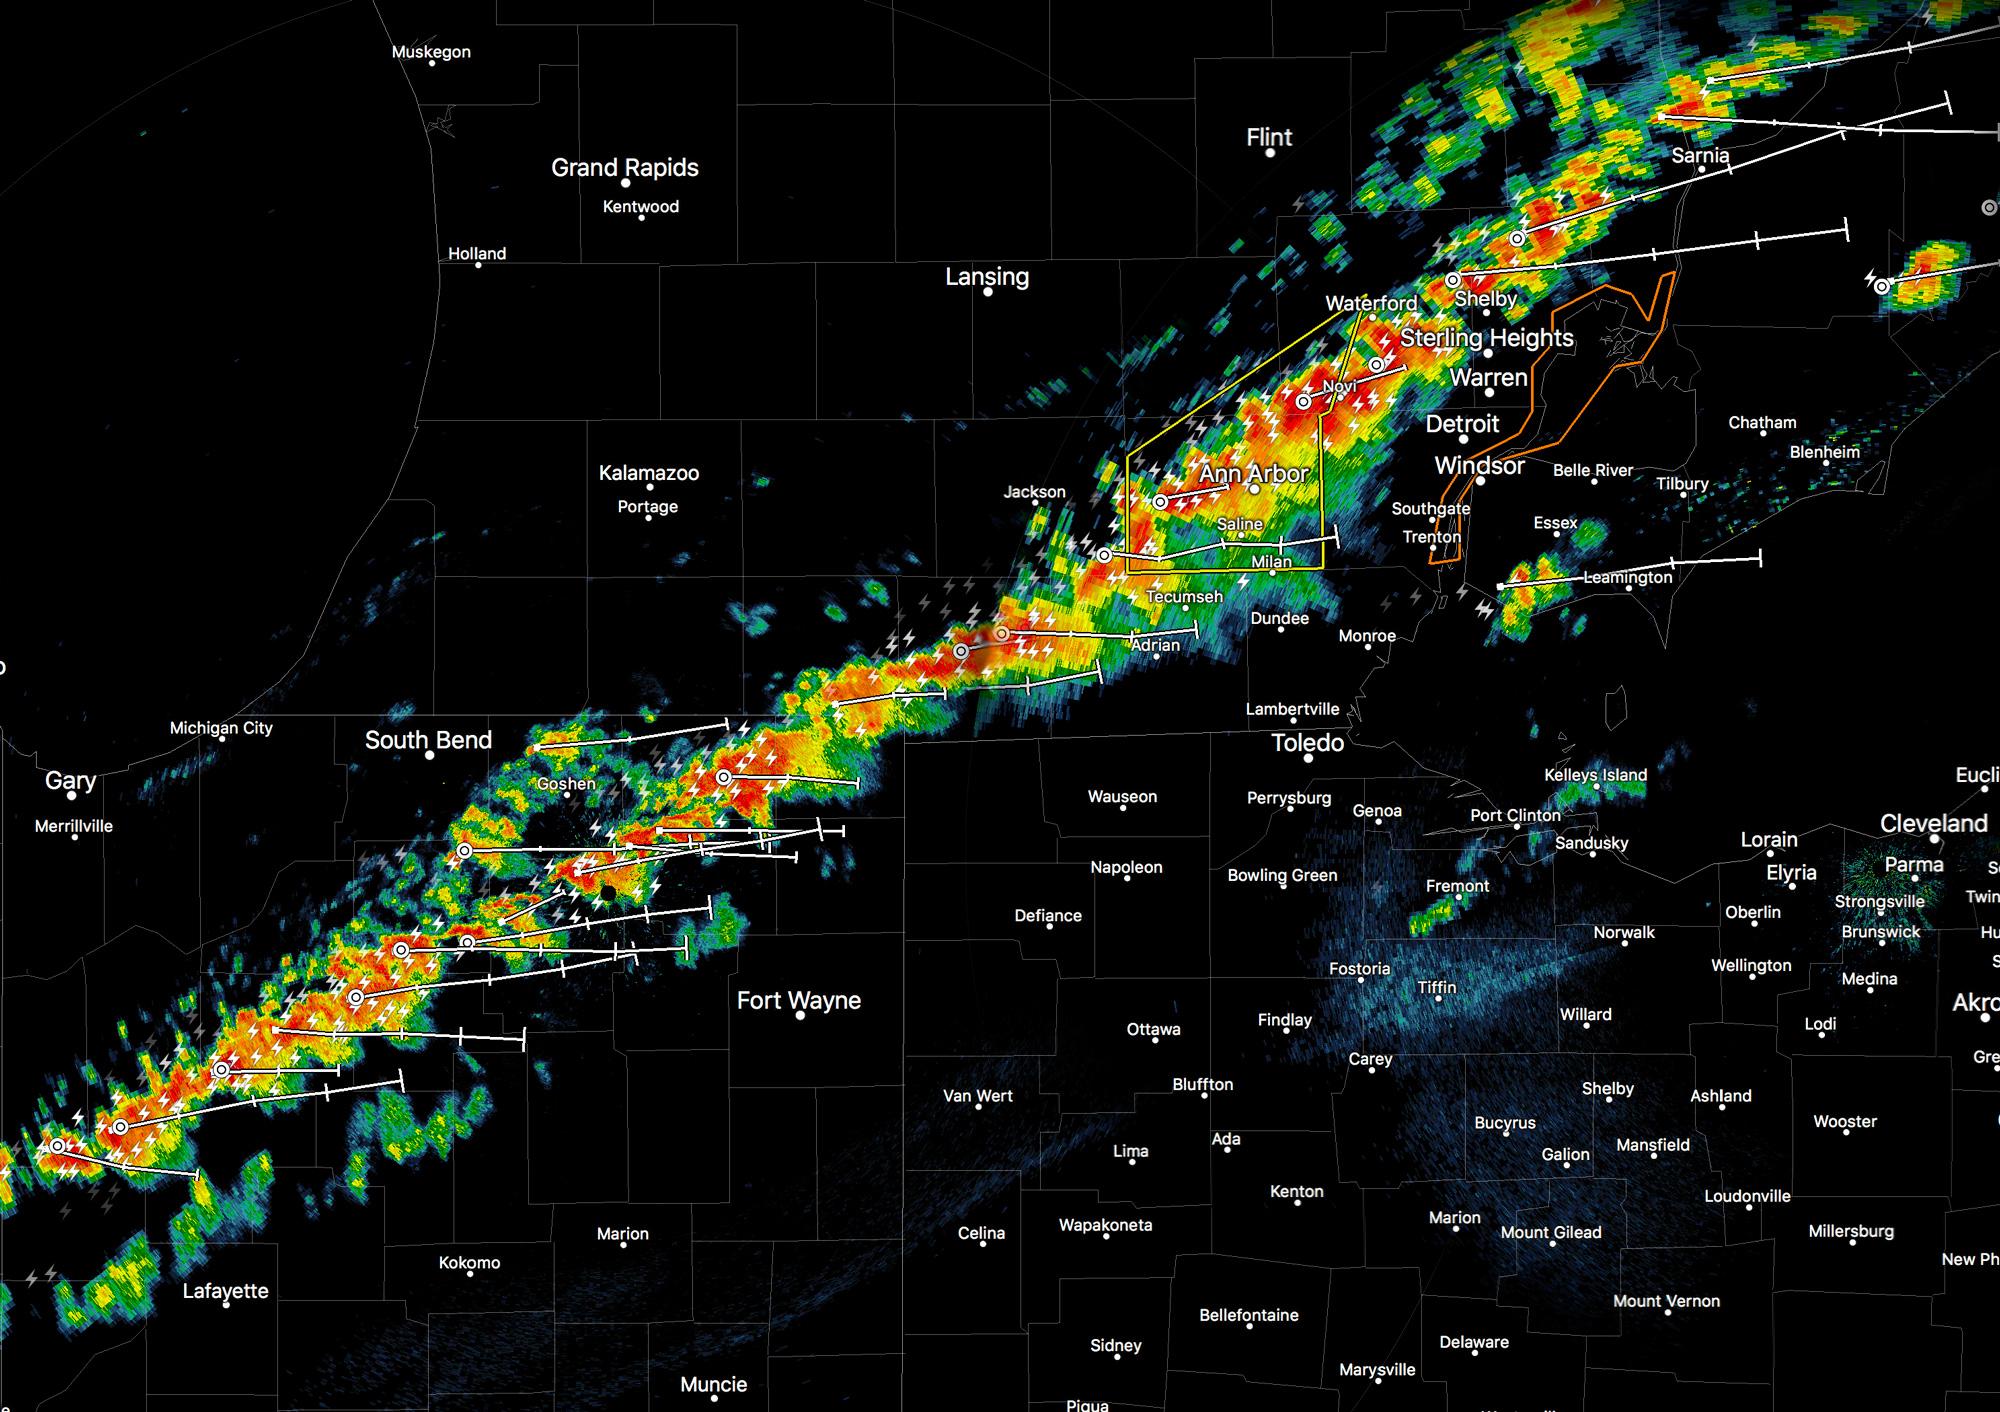 Image: Radar Image of Line of Storms. September 4, 2017